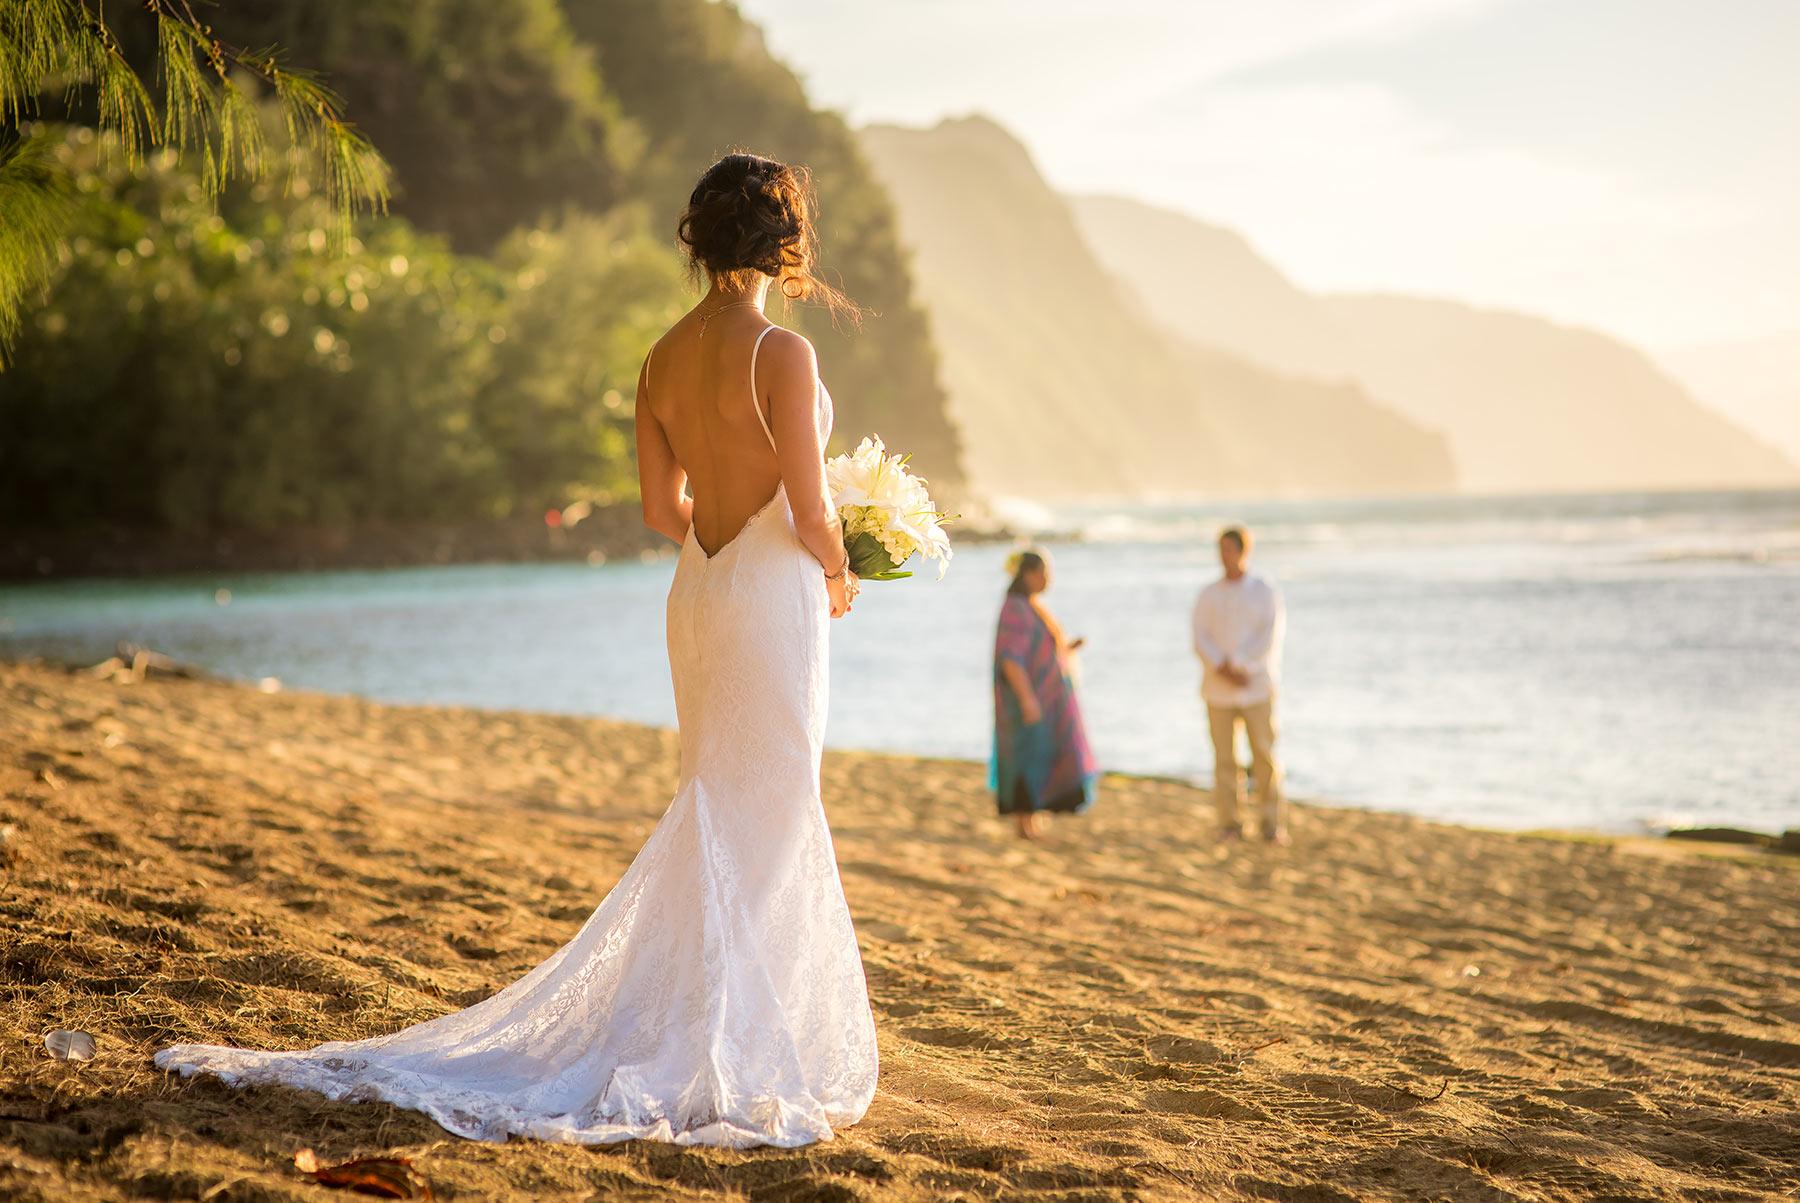 Wedding on Kee Beach, Kauai by photographer by Harneet Bajwa.